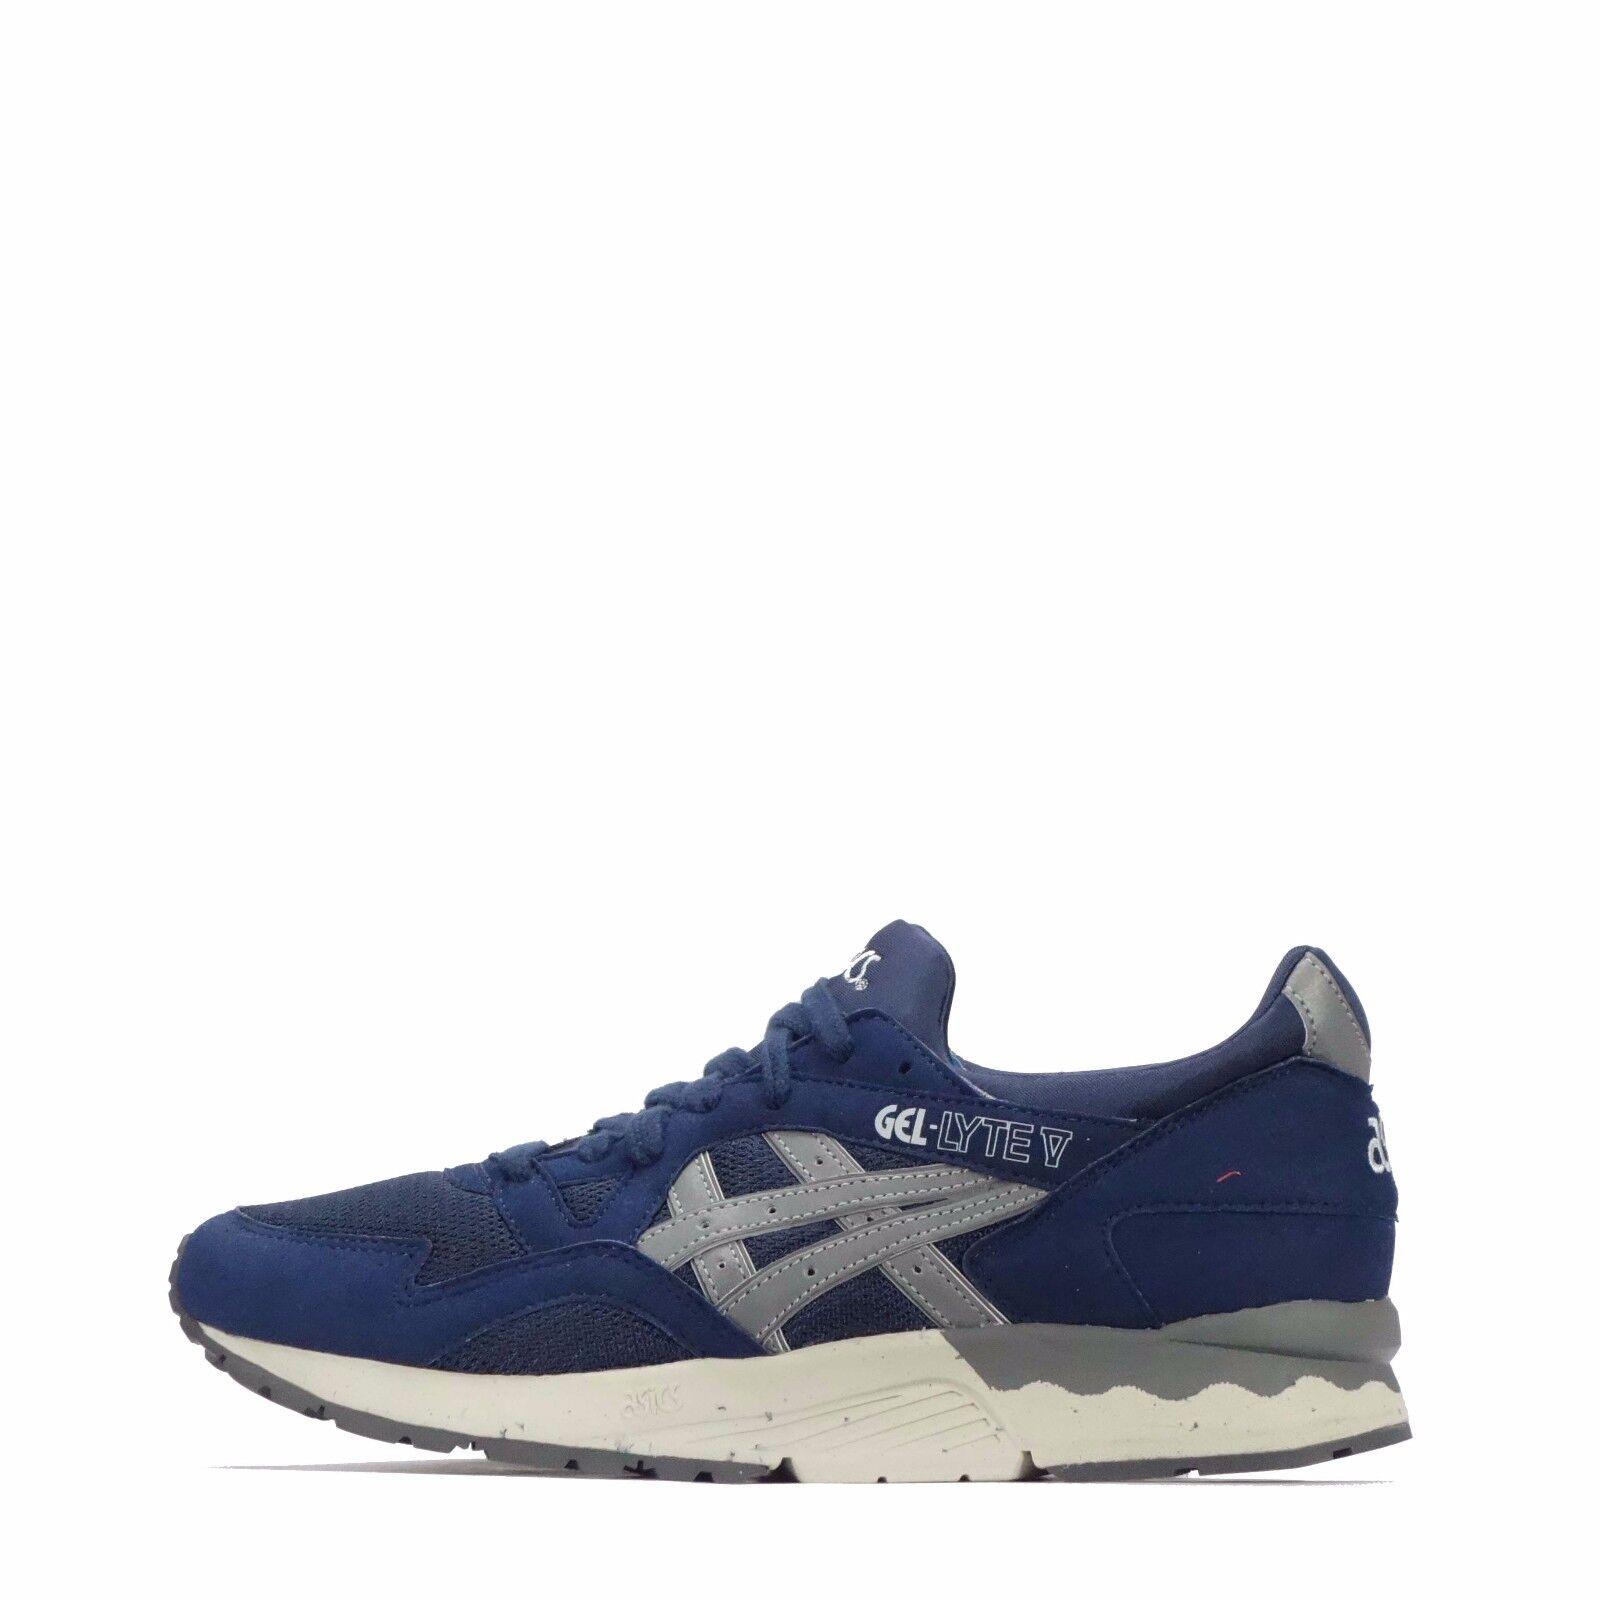 a5752b33c840d5 Asics Asics Asics Gel-Lyte V Men s Shoes Navy Soft Grey 5006ea ...